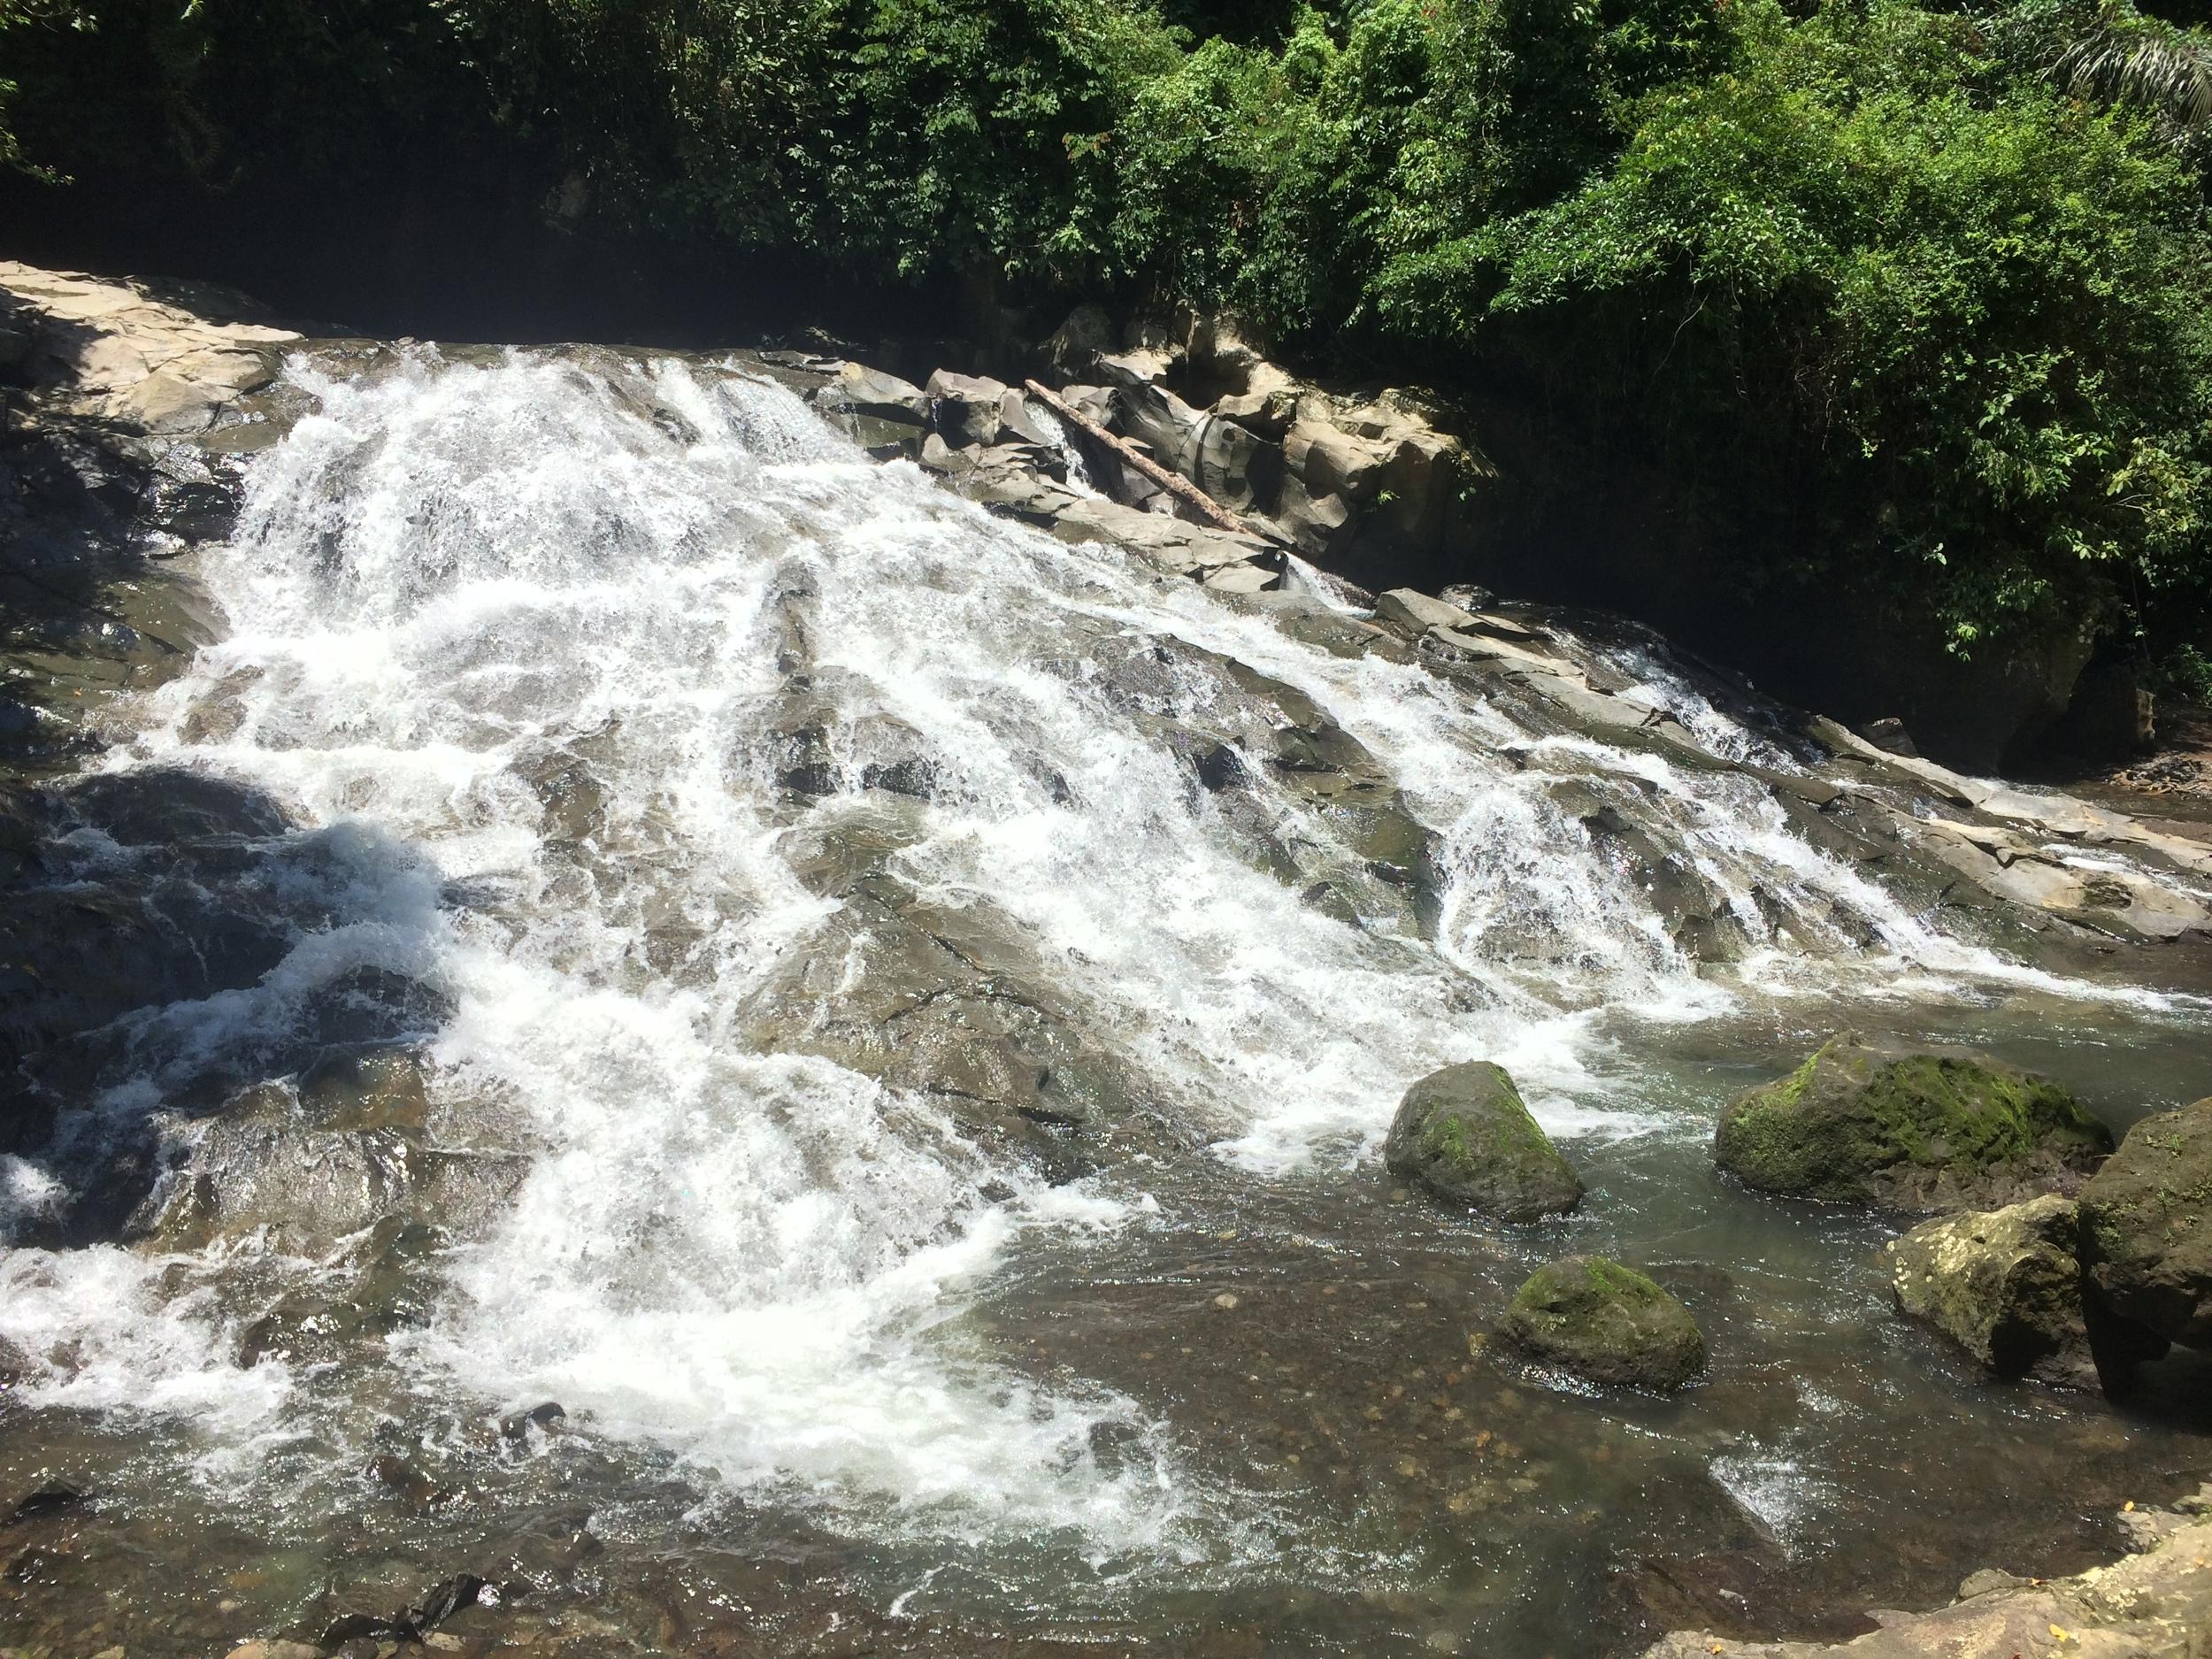 The low cascade of Goa Rang Reng